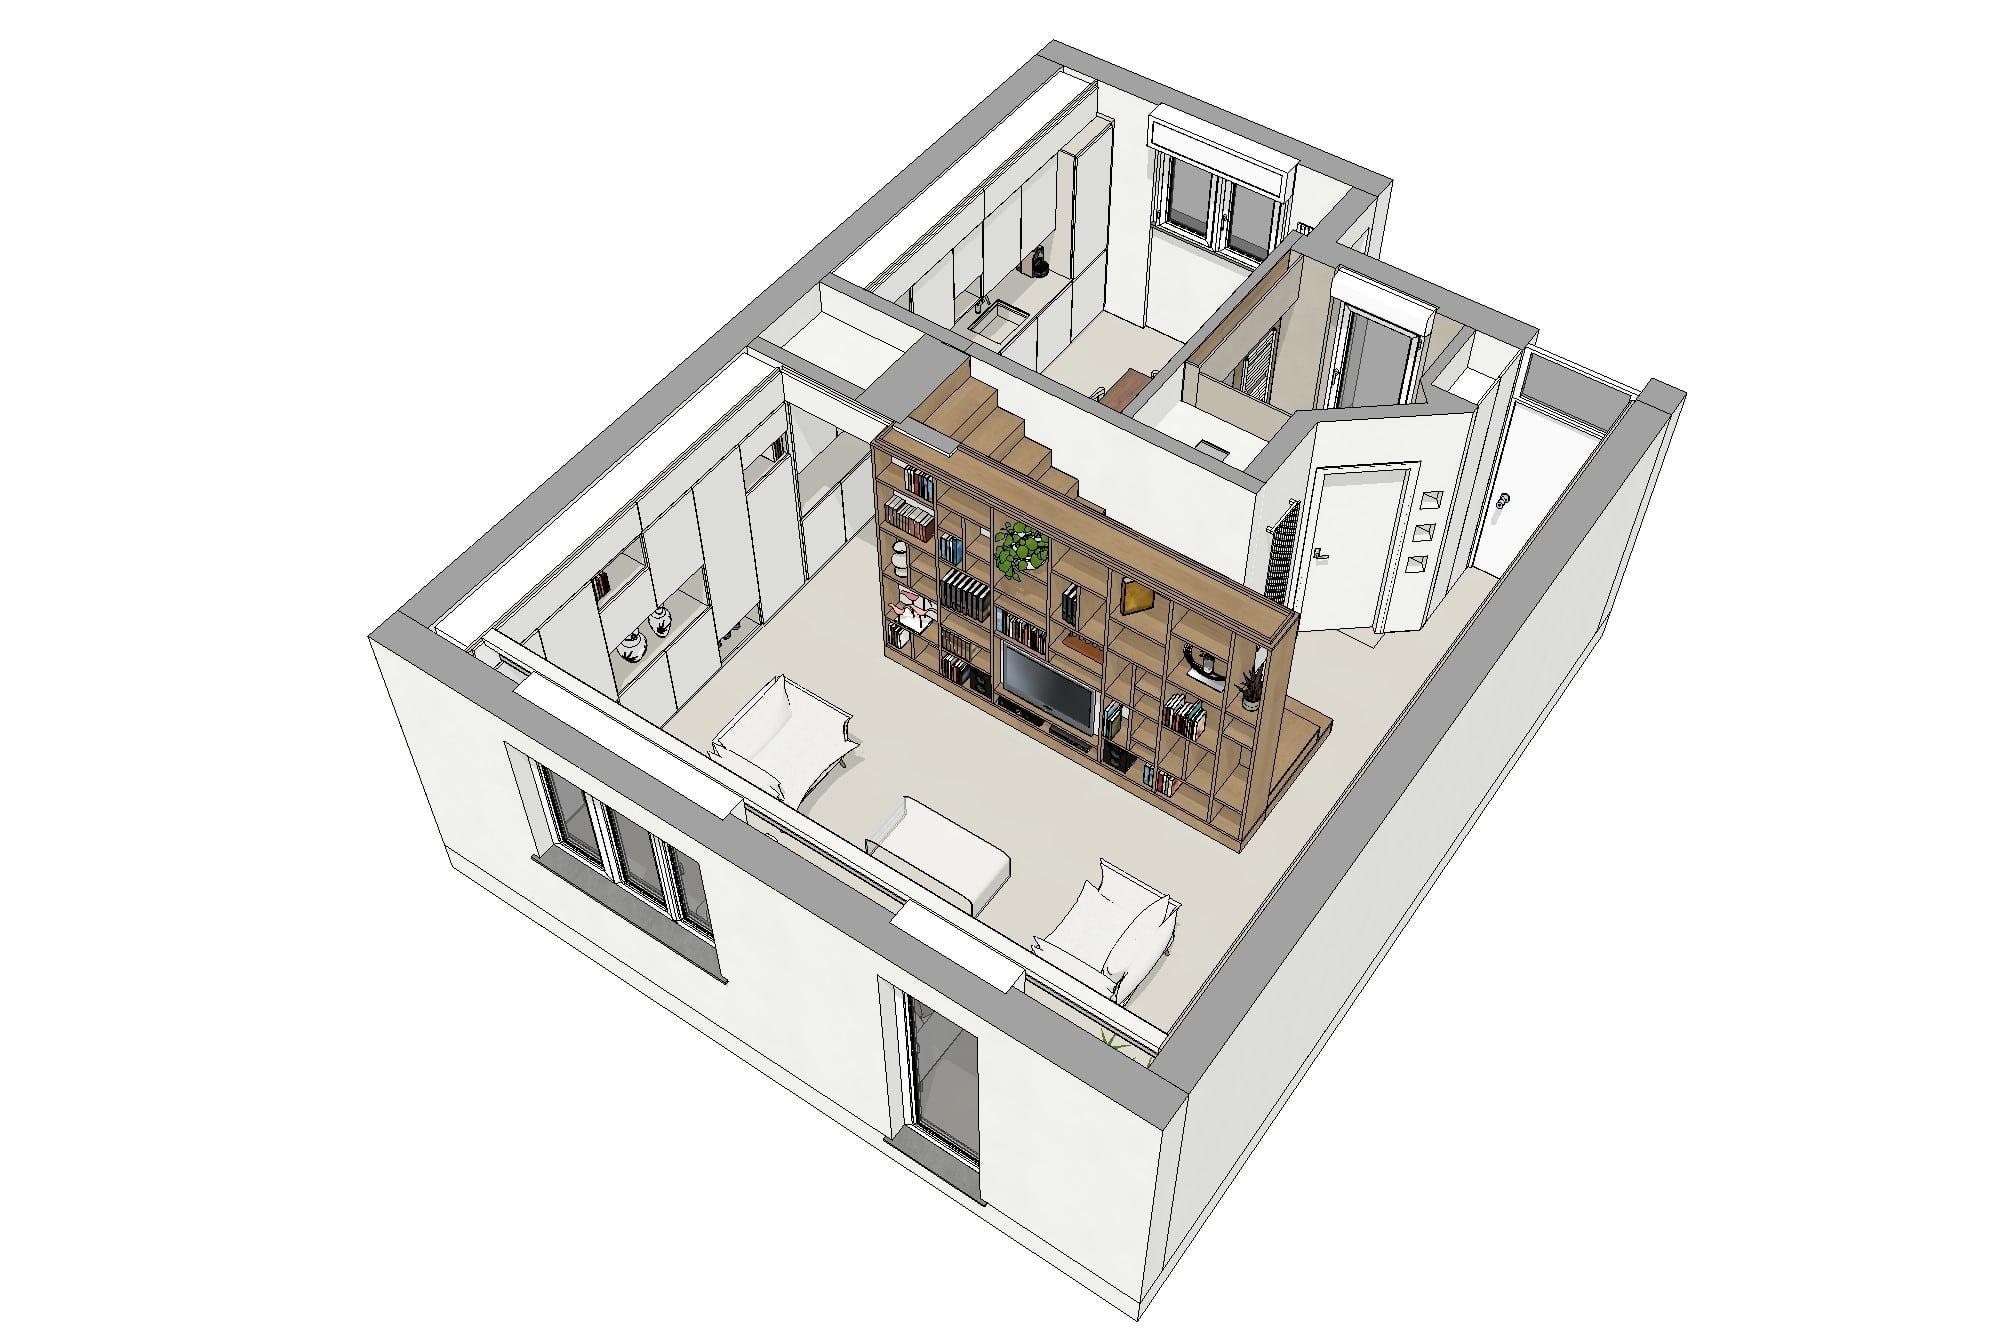 casapaola-mappa-3D